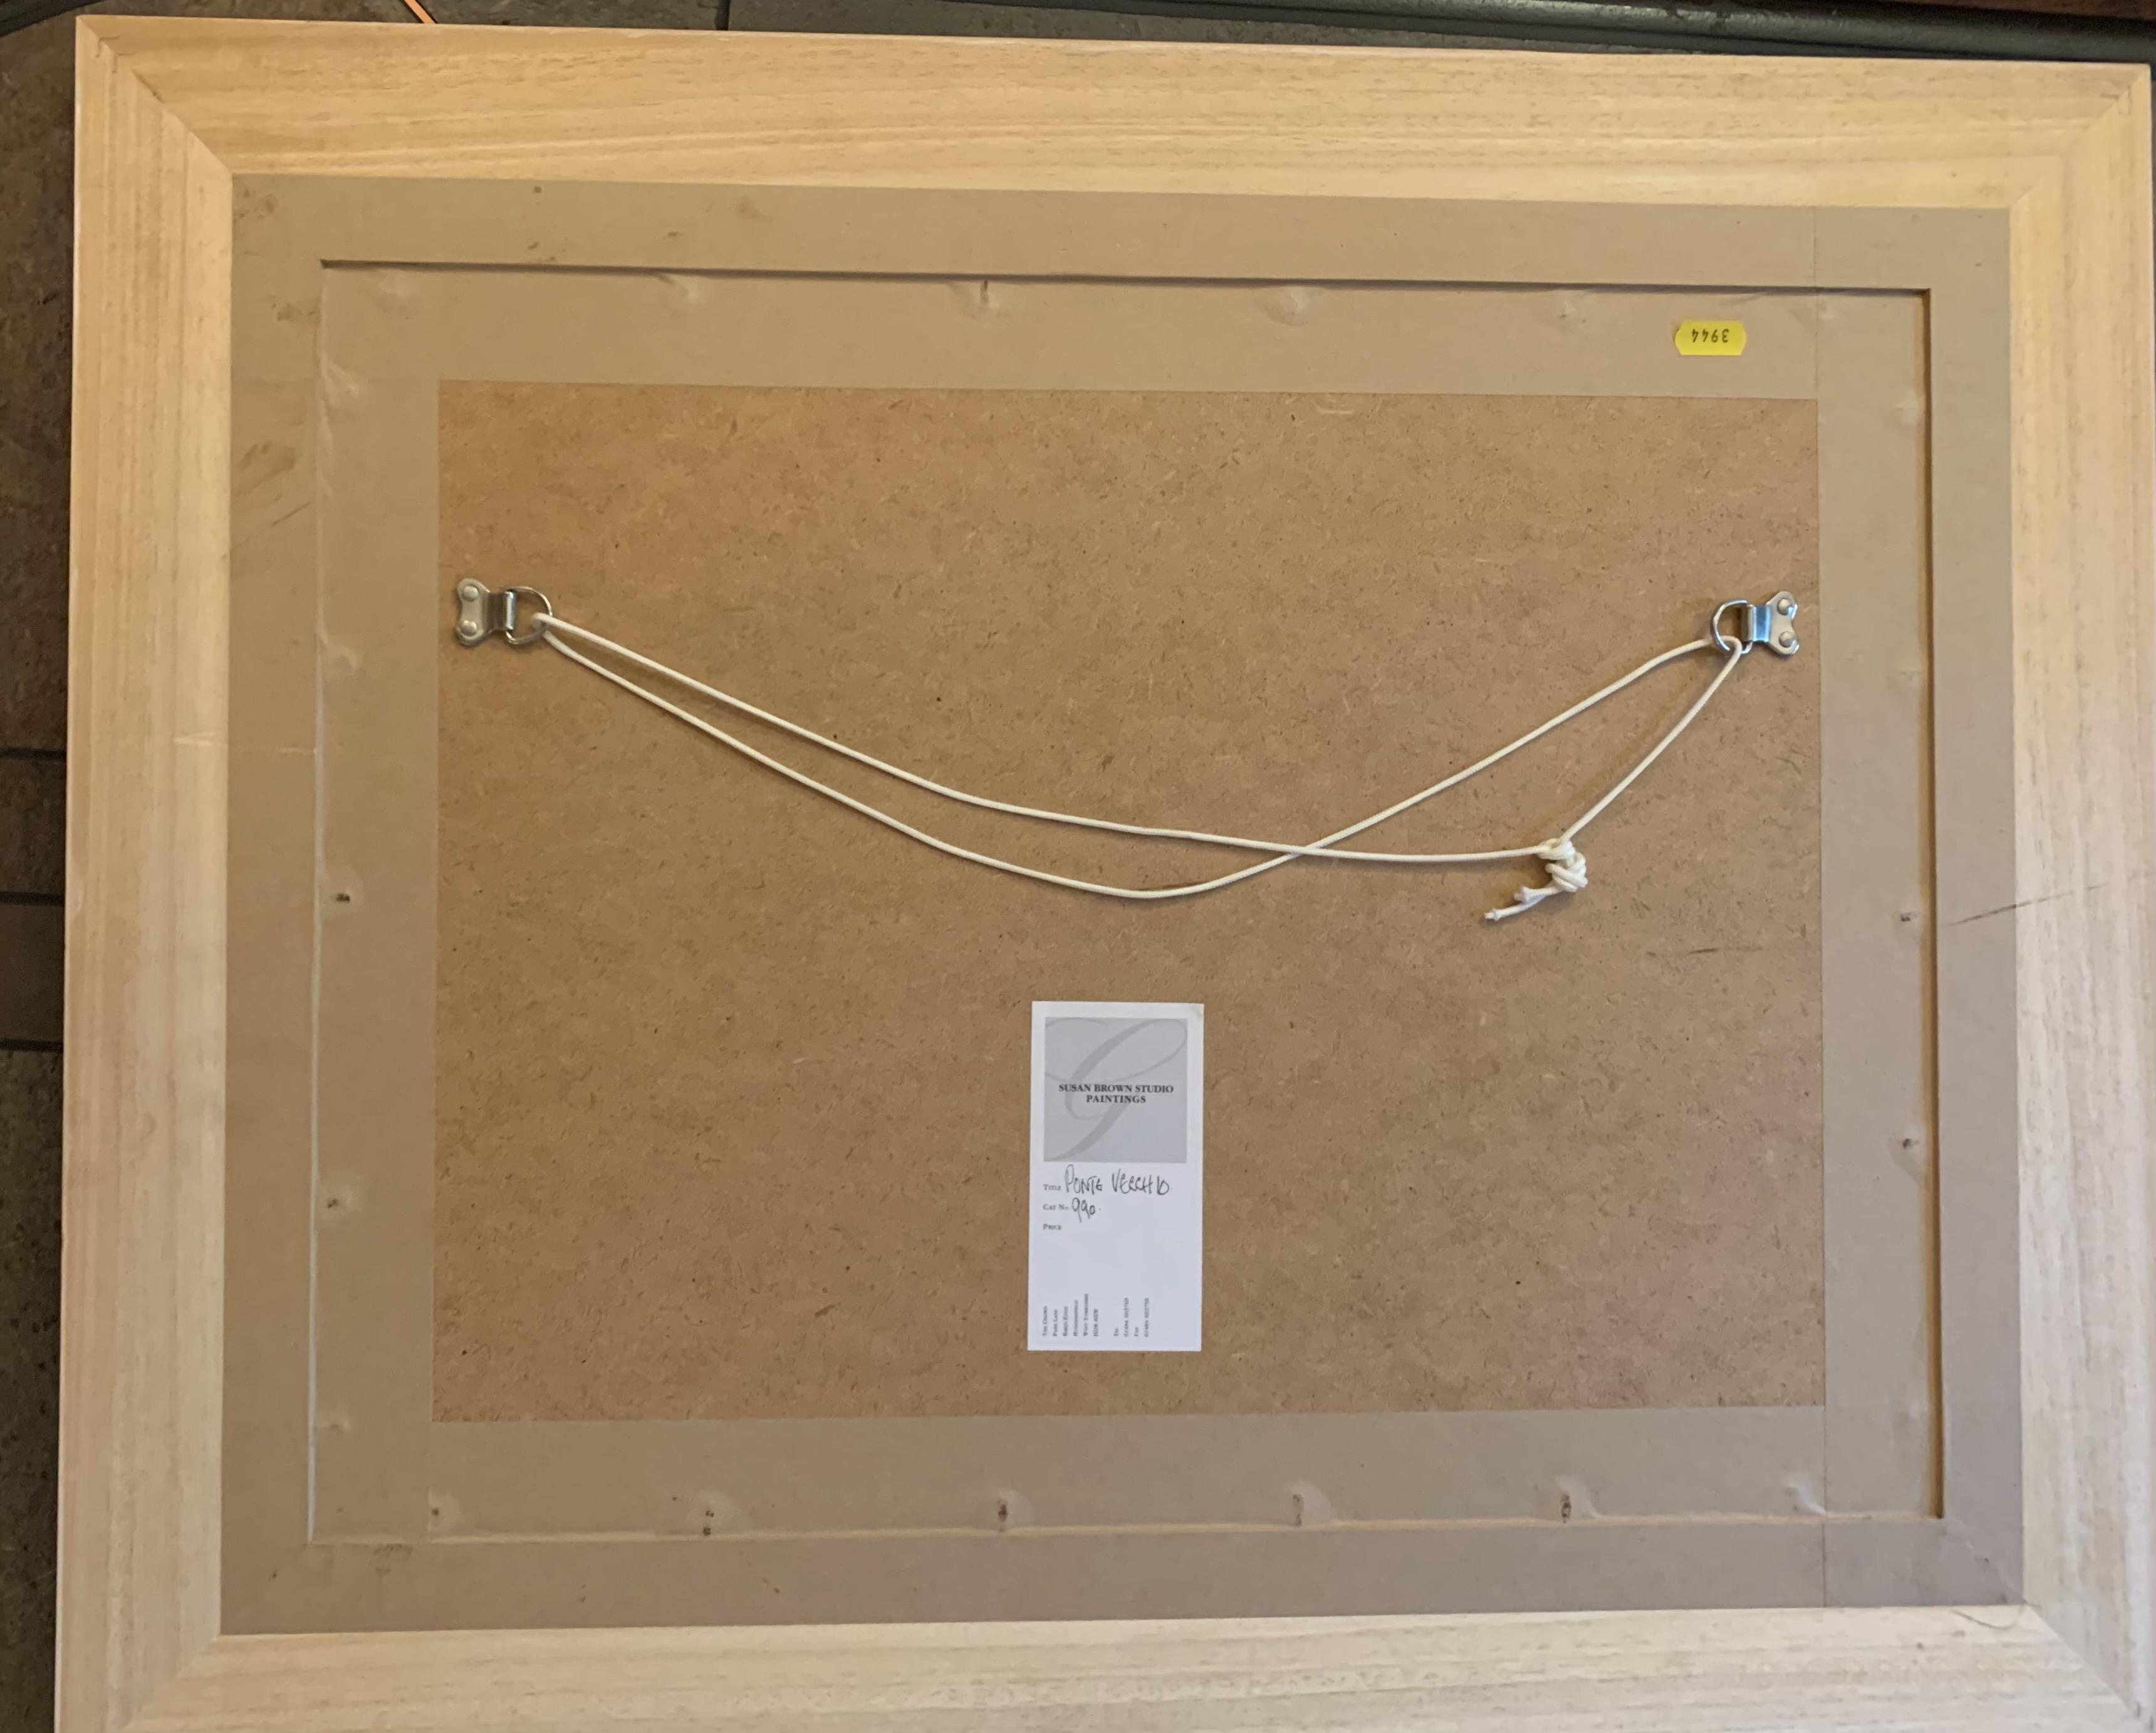 "Susan Brown watercolour 'Ponte Vecchio' , image 20"" x 14"", frame 29"" x 23.5"" good condition - Image 3 of 4"